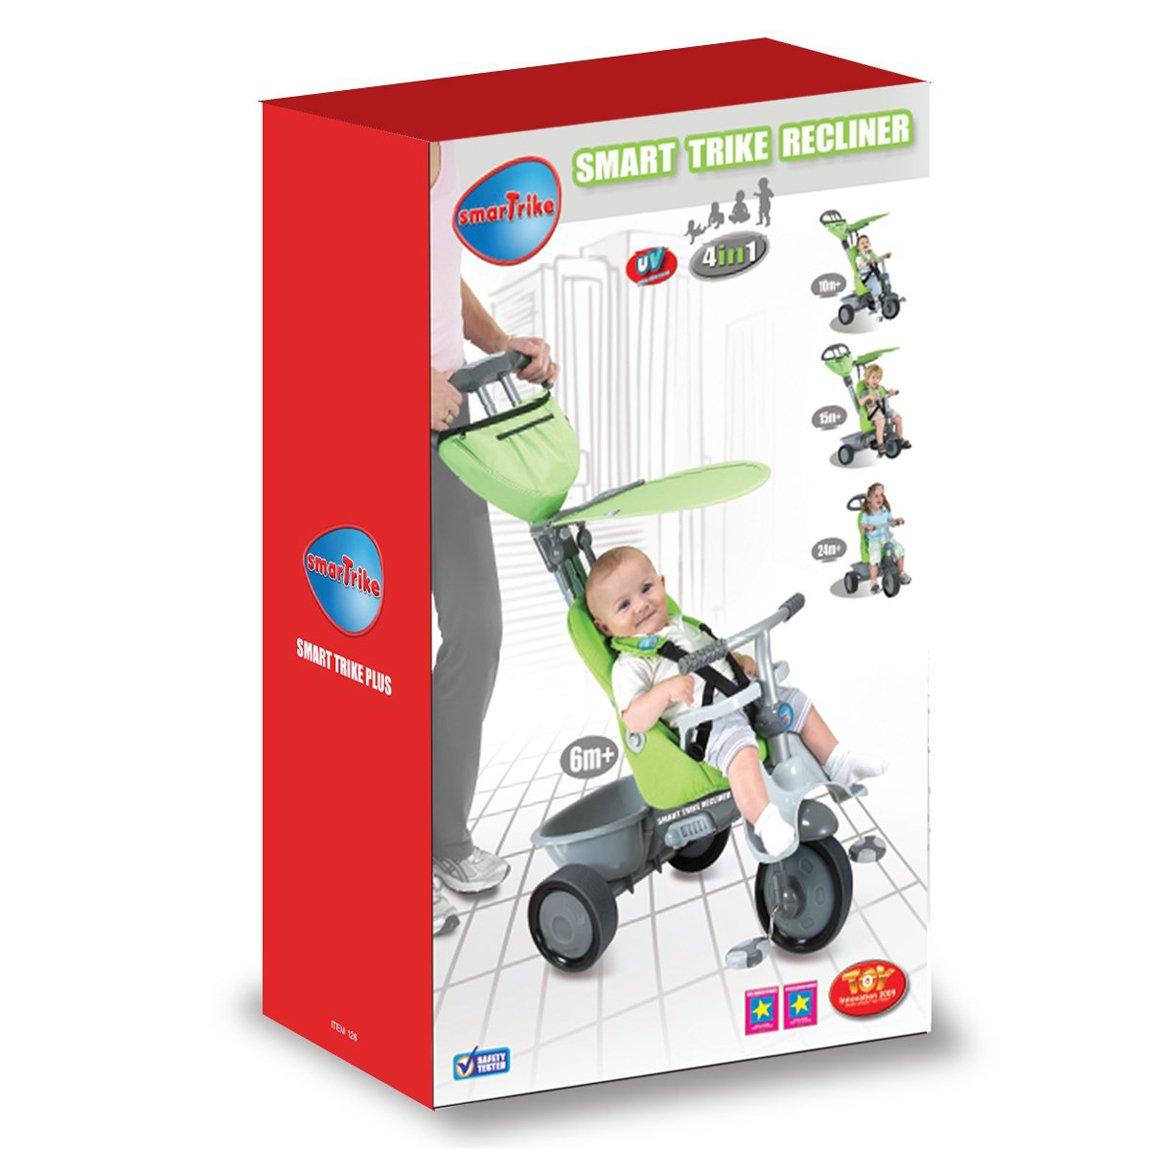 sc 1 st  Amazon UK & SmarTrike Recliner 4-in-1 - Green: Amazon.co.uk: Toys u0026 Games islam-shia.org